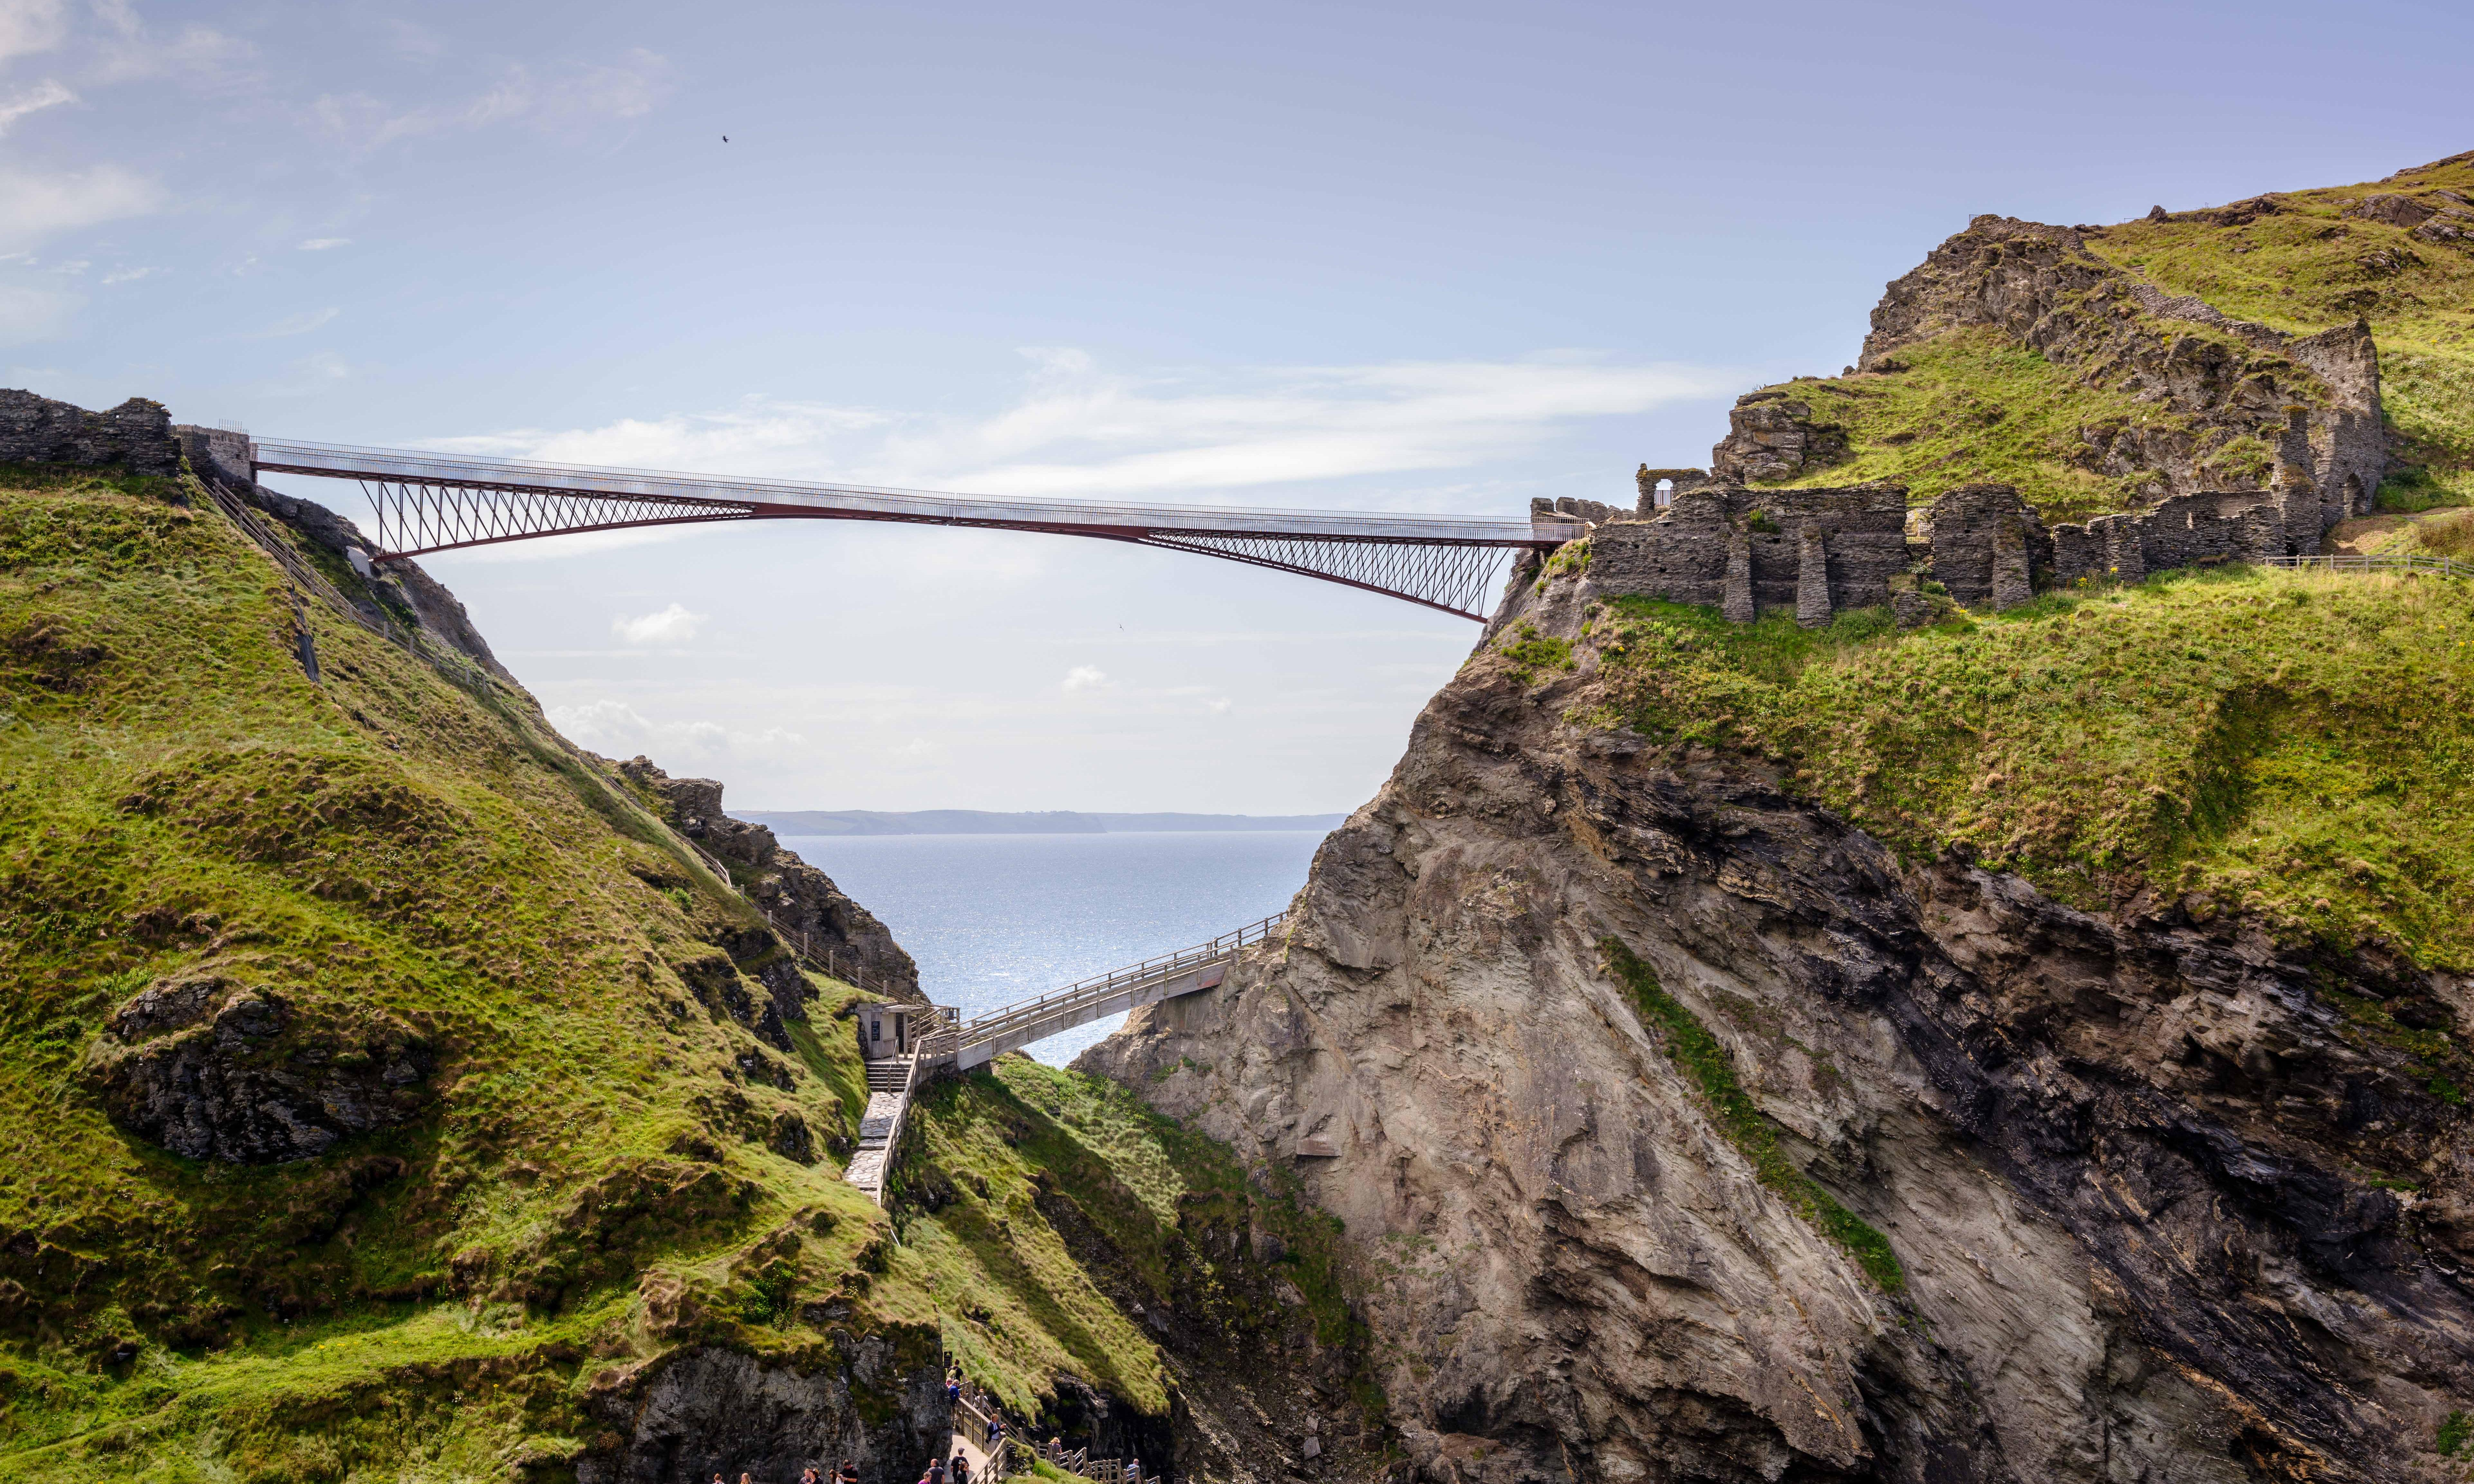 Gossamer gateway to Avalon: Tintagel Castle bridge brings magic to history